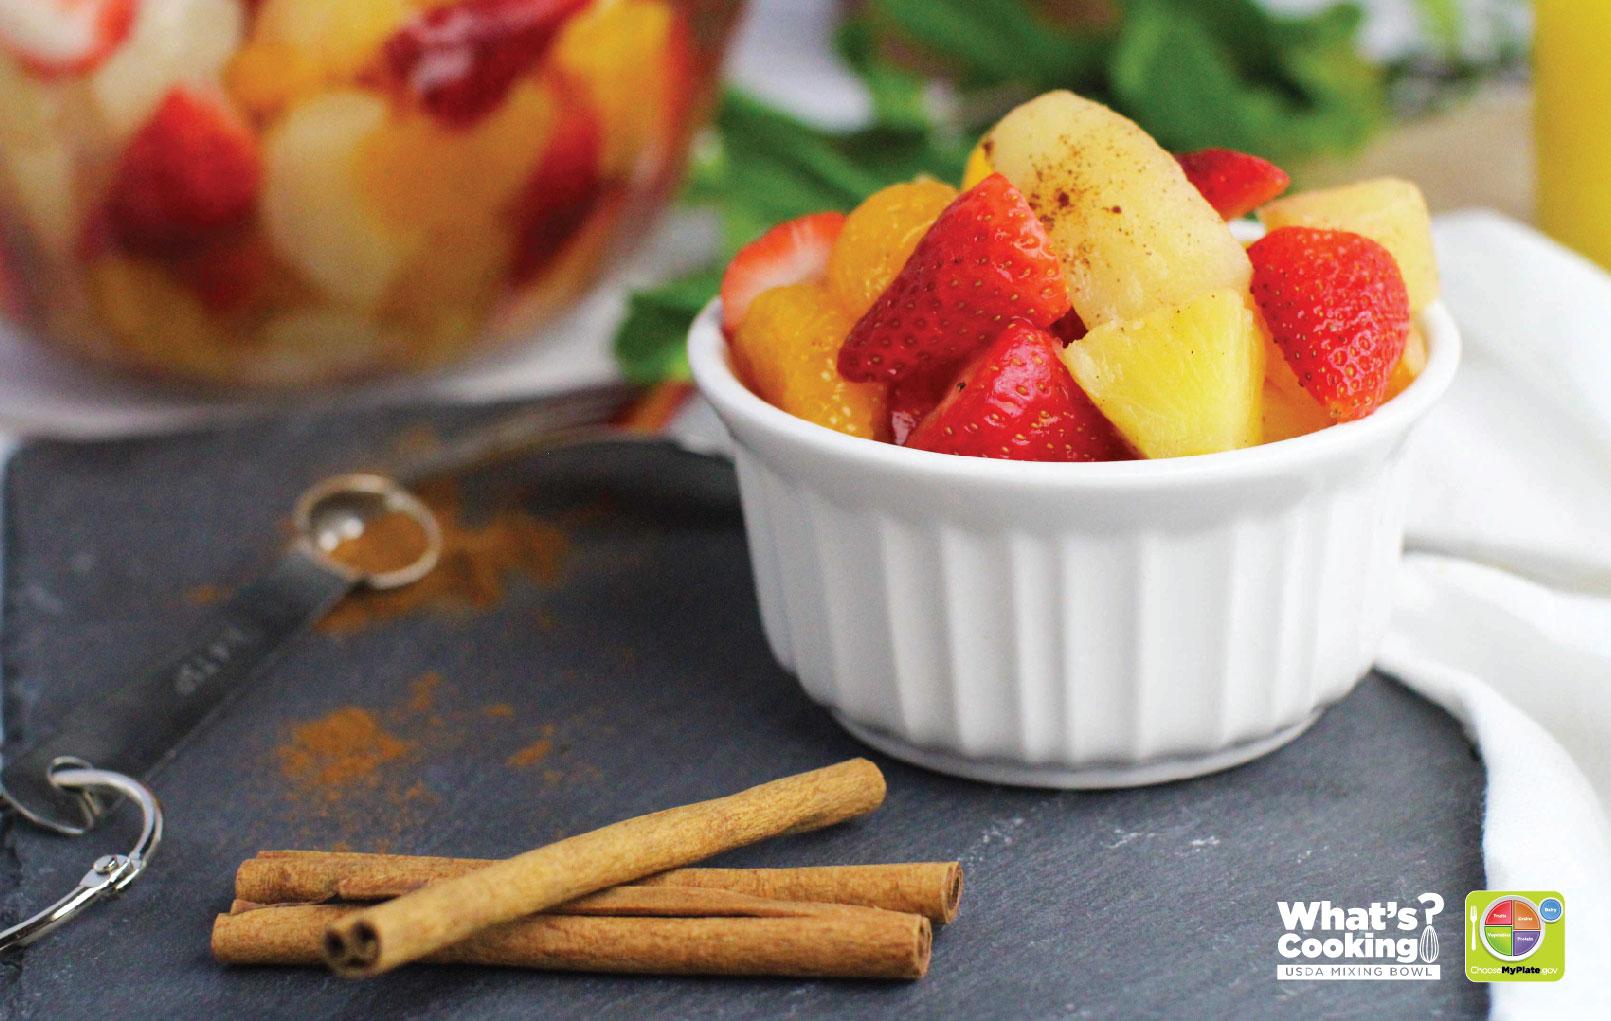 Focus On Fruit: Berries, 5 Different Ways